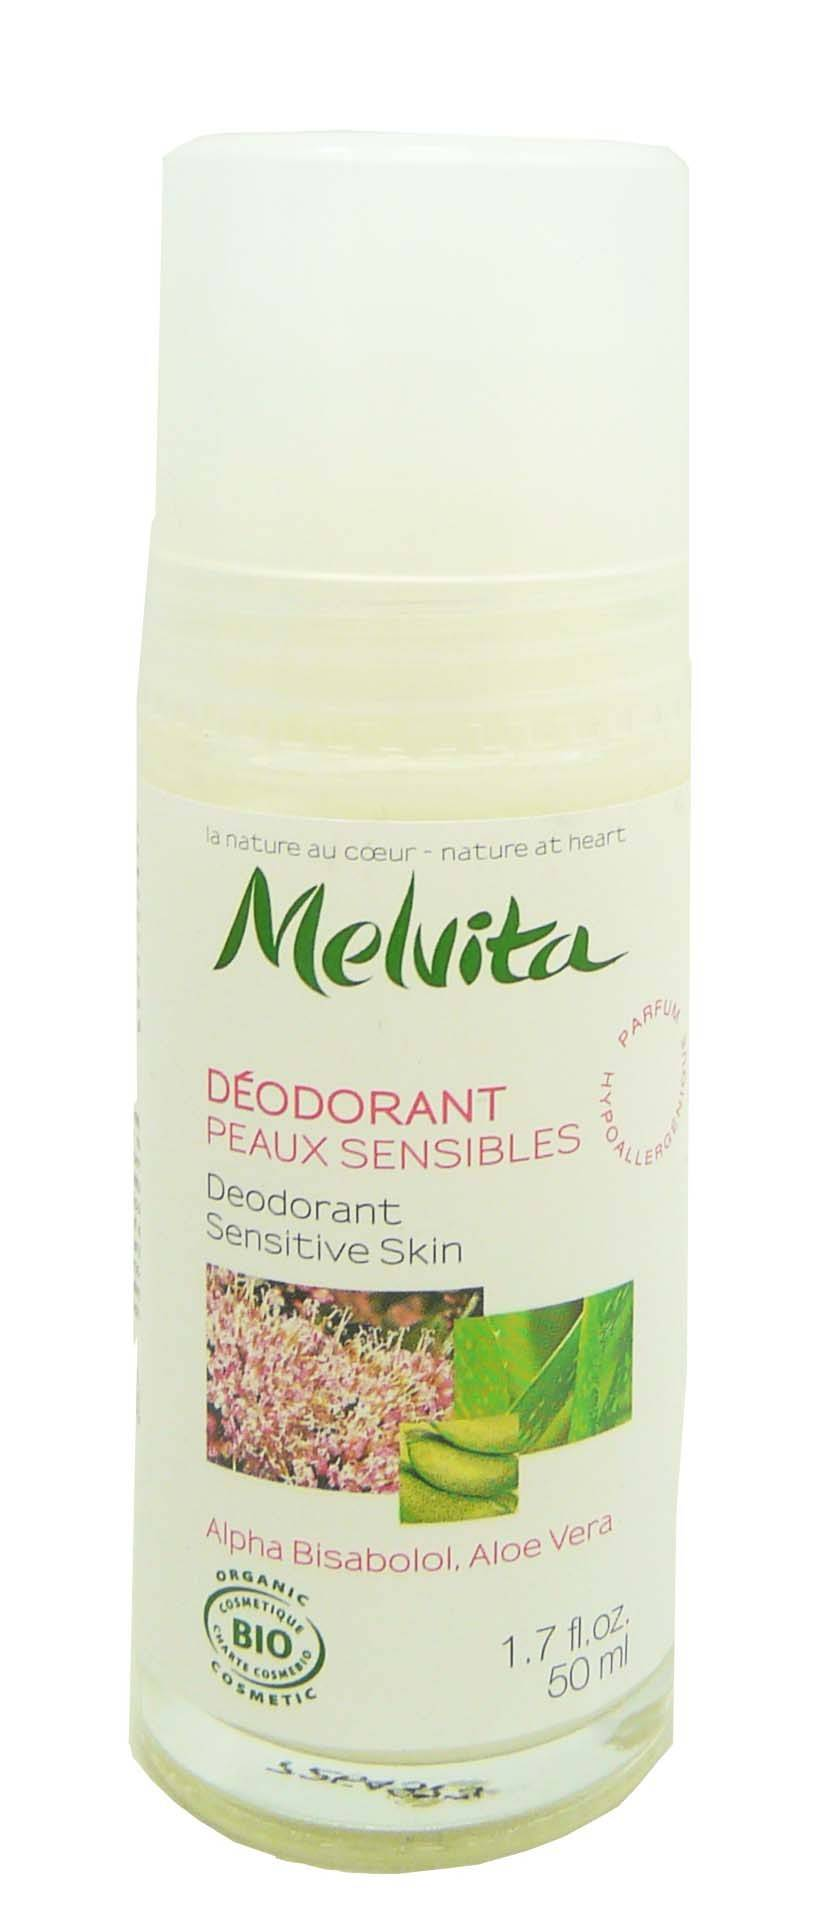 Melvita deodorant roll on  peaux sensibles 50ml